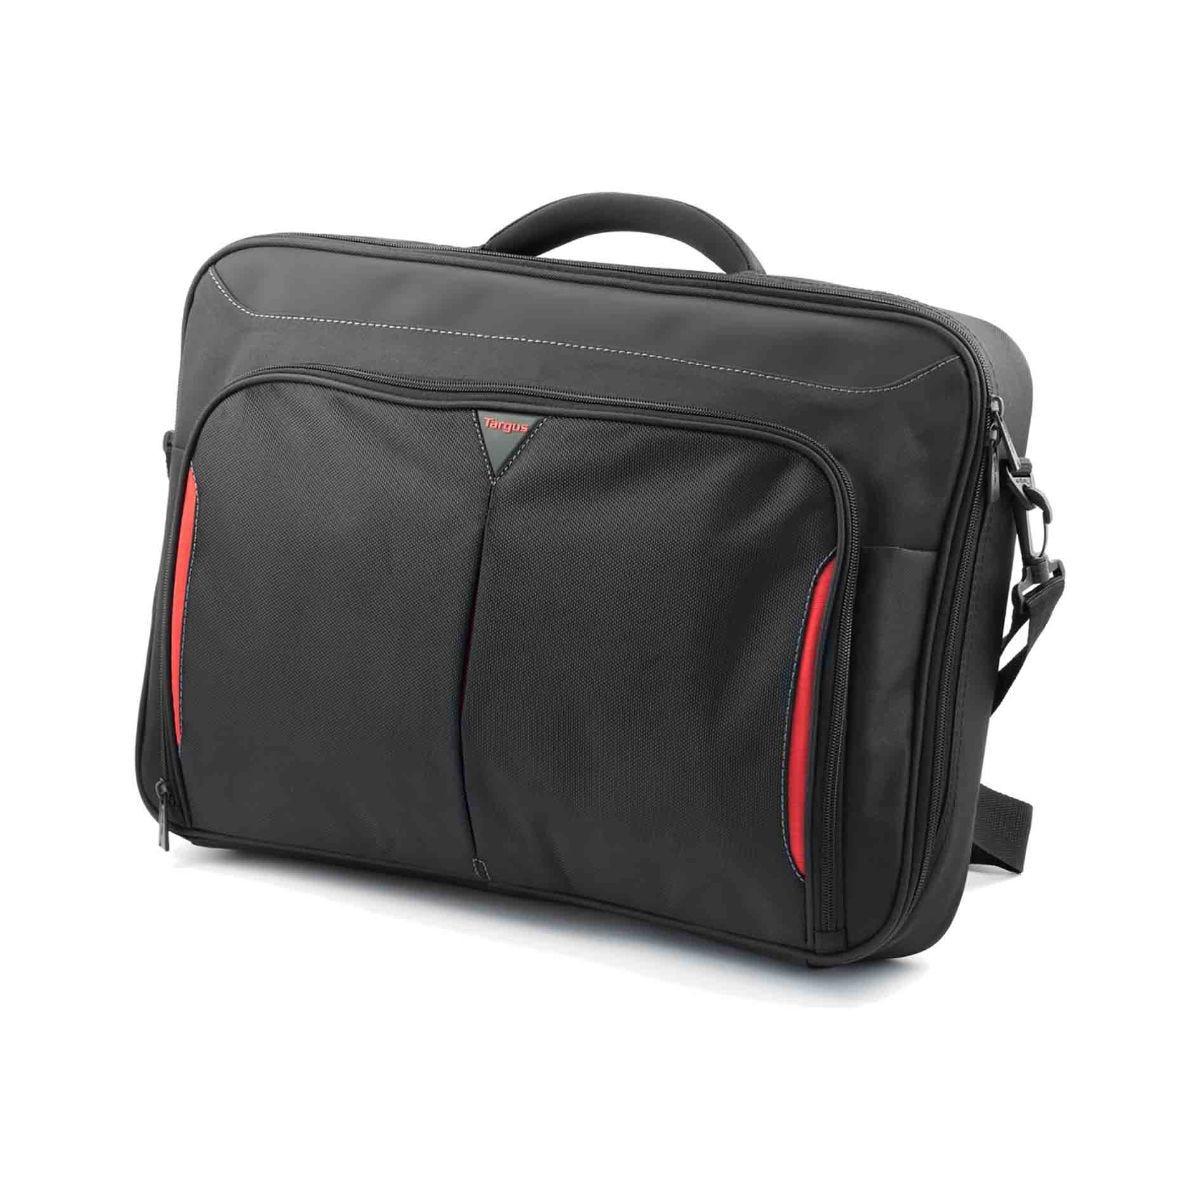 227b1c20f35d Targus Classic Plus Clamshell Laptop Bag 17-18 Inch 5051794008111